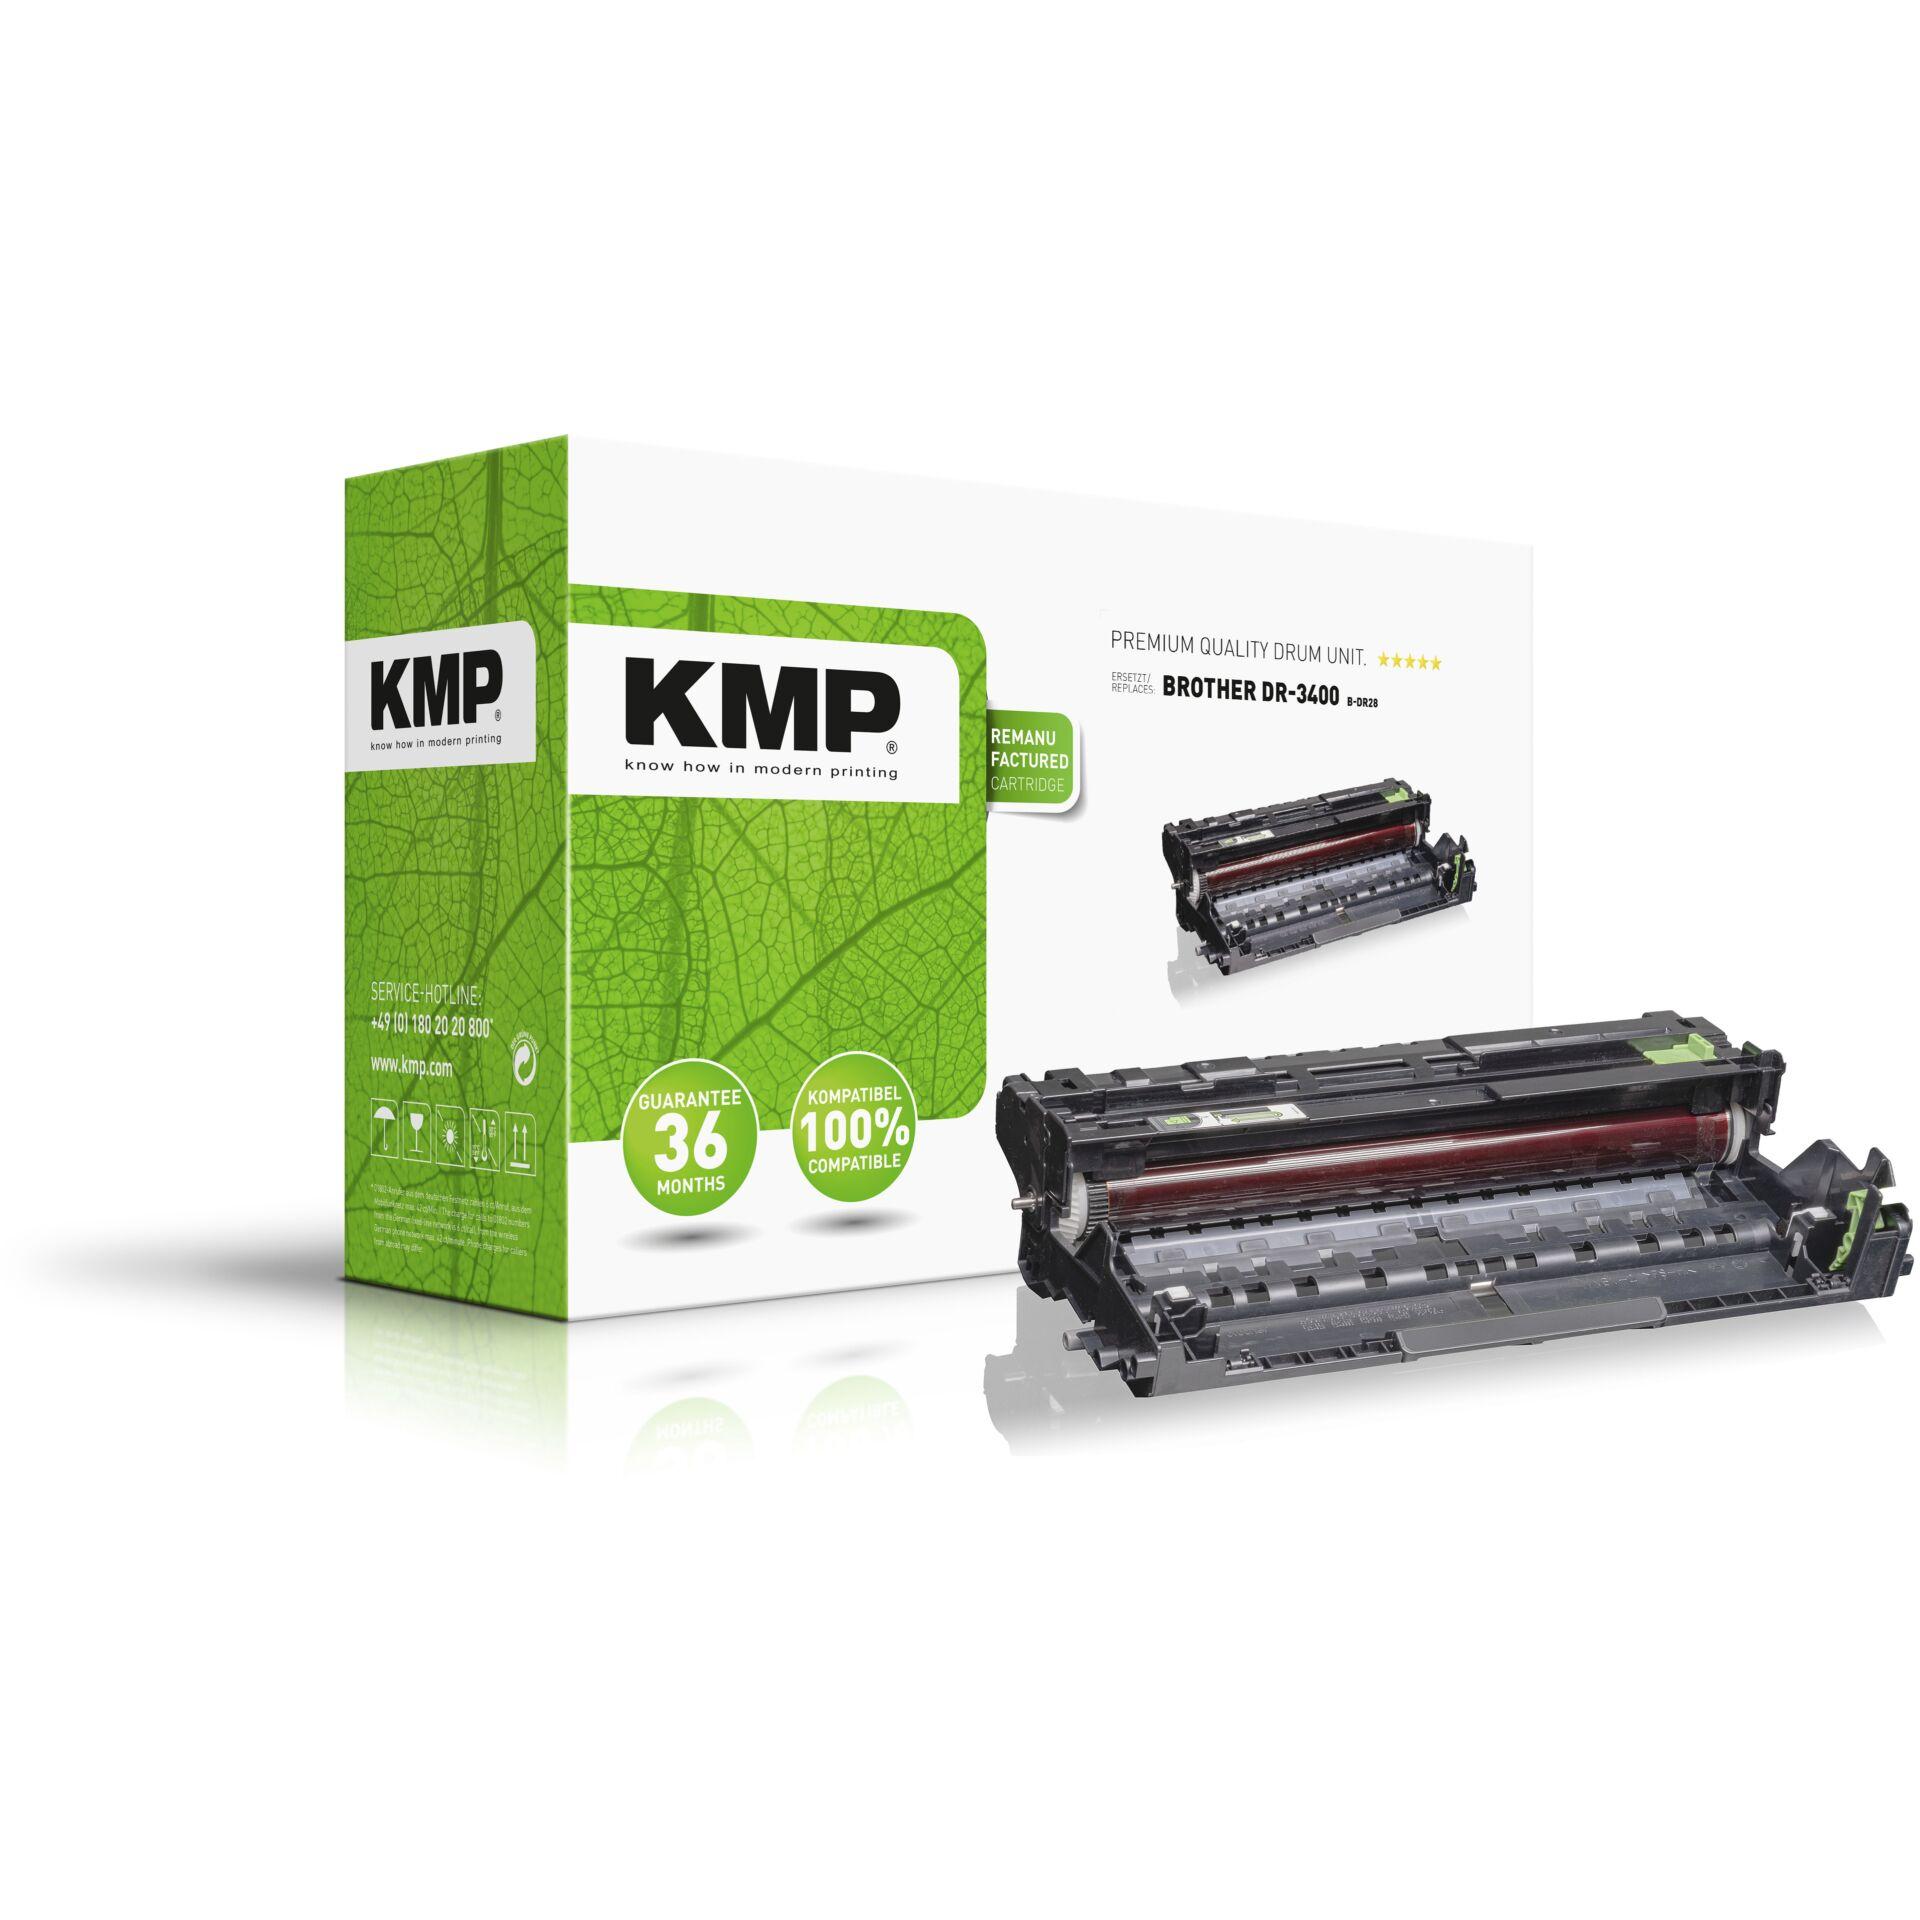 KMP B-DR28 Drum Unit for Brother DR-3400